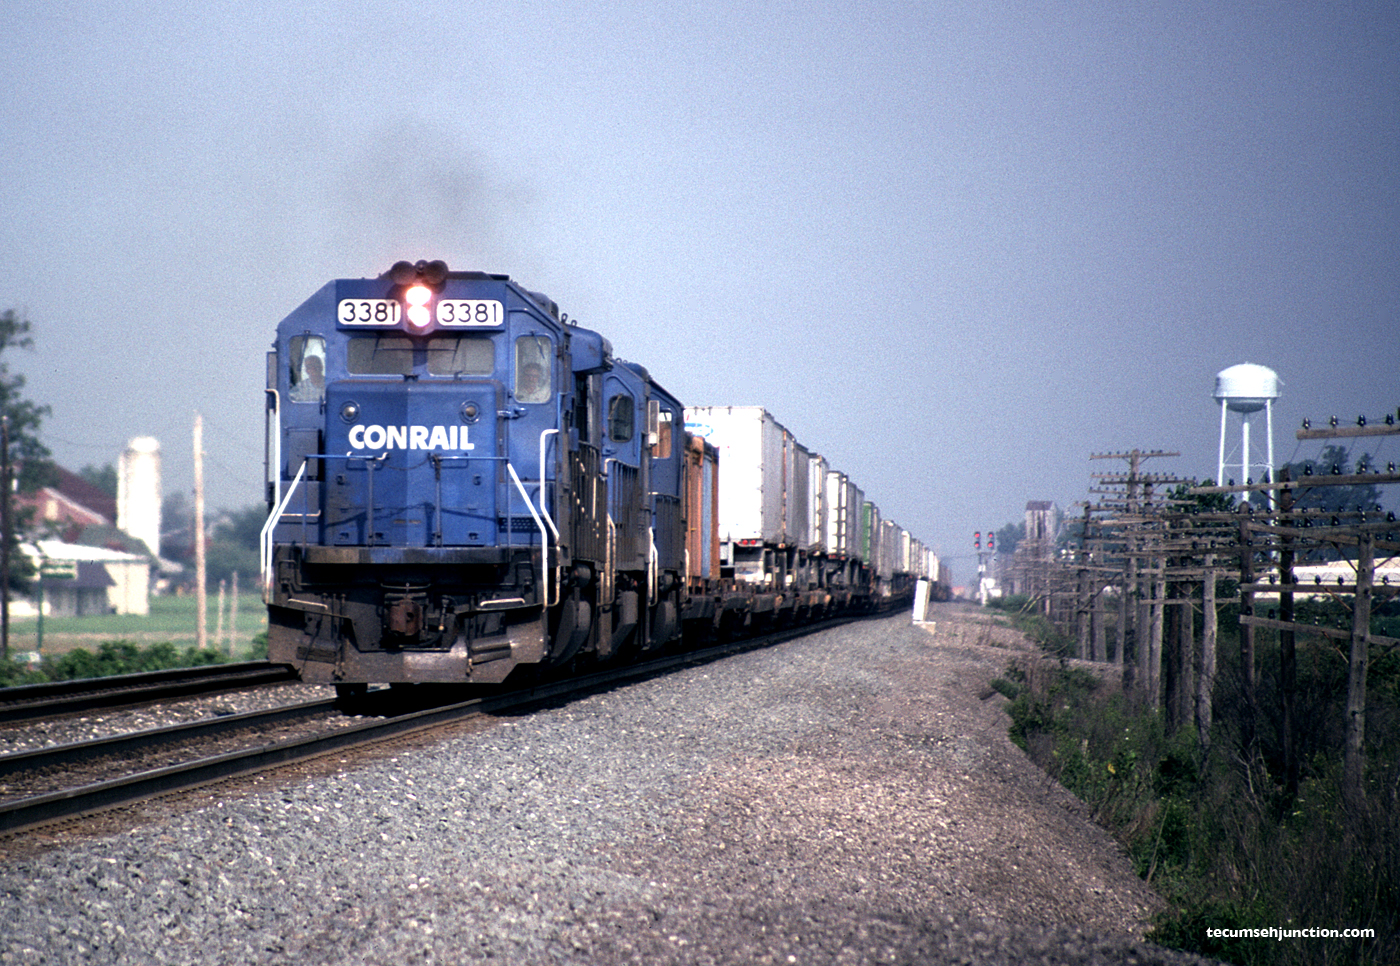 Trailvan train at Edgerton, OH